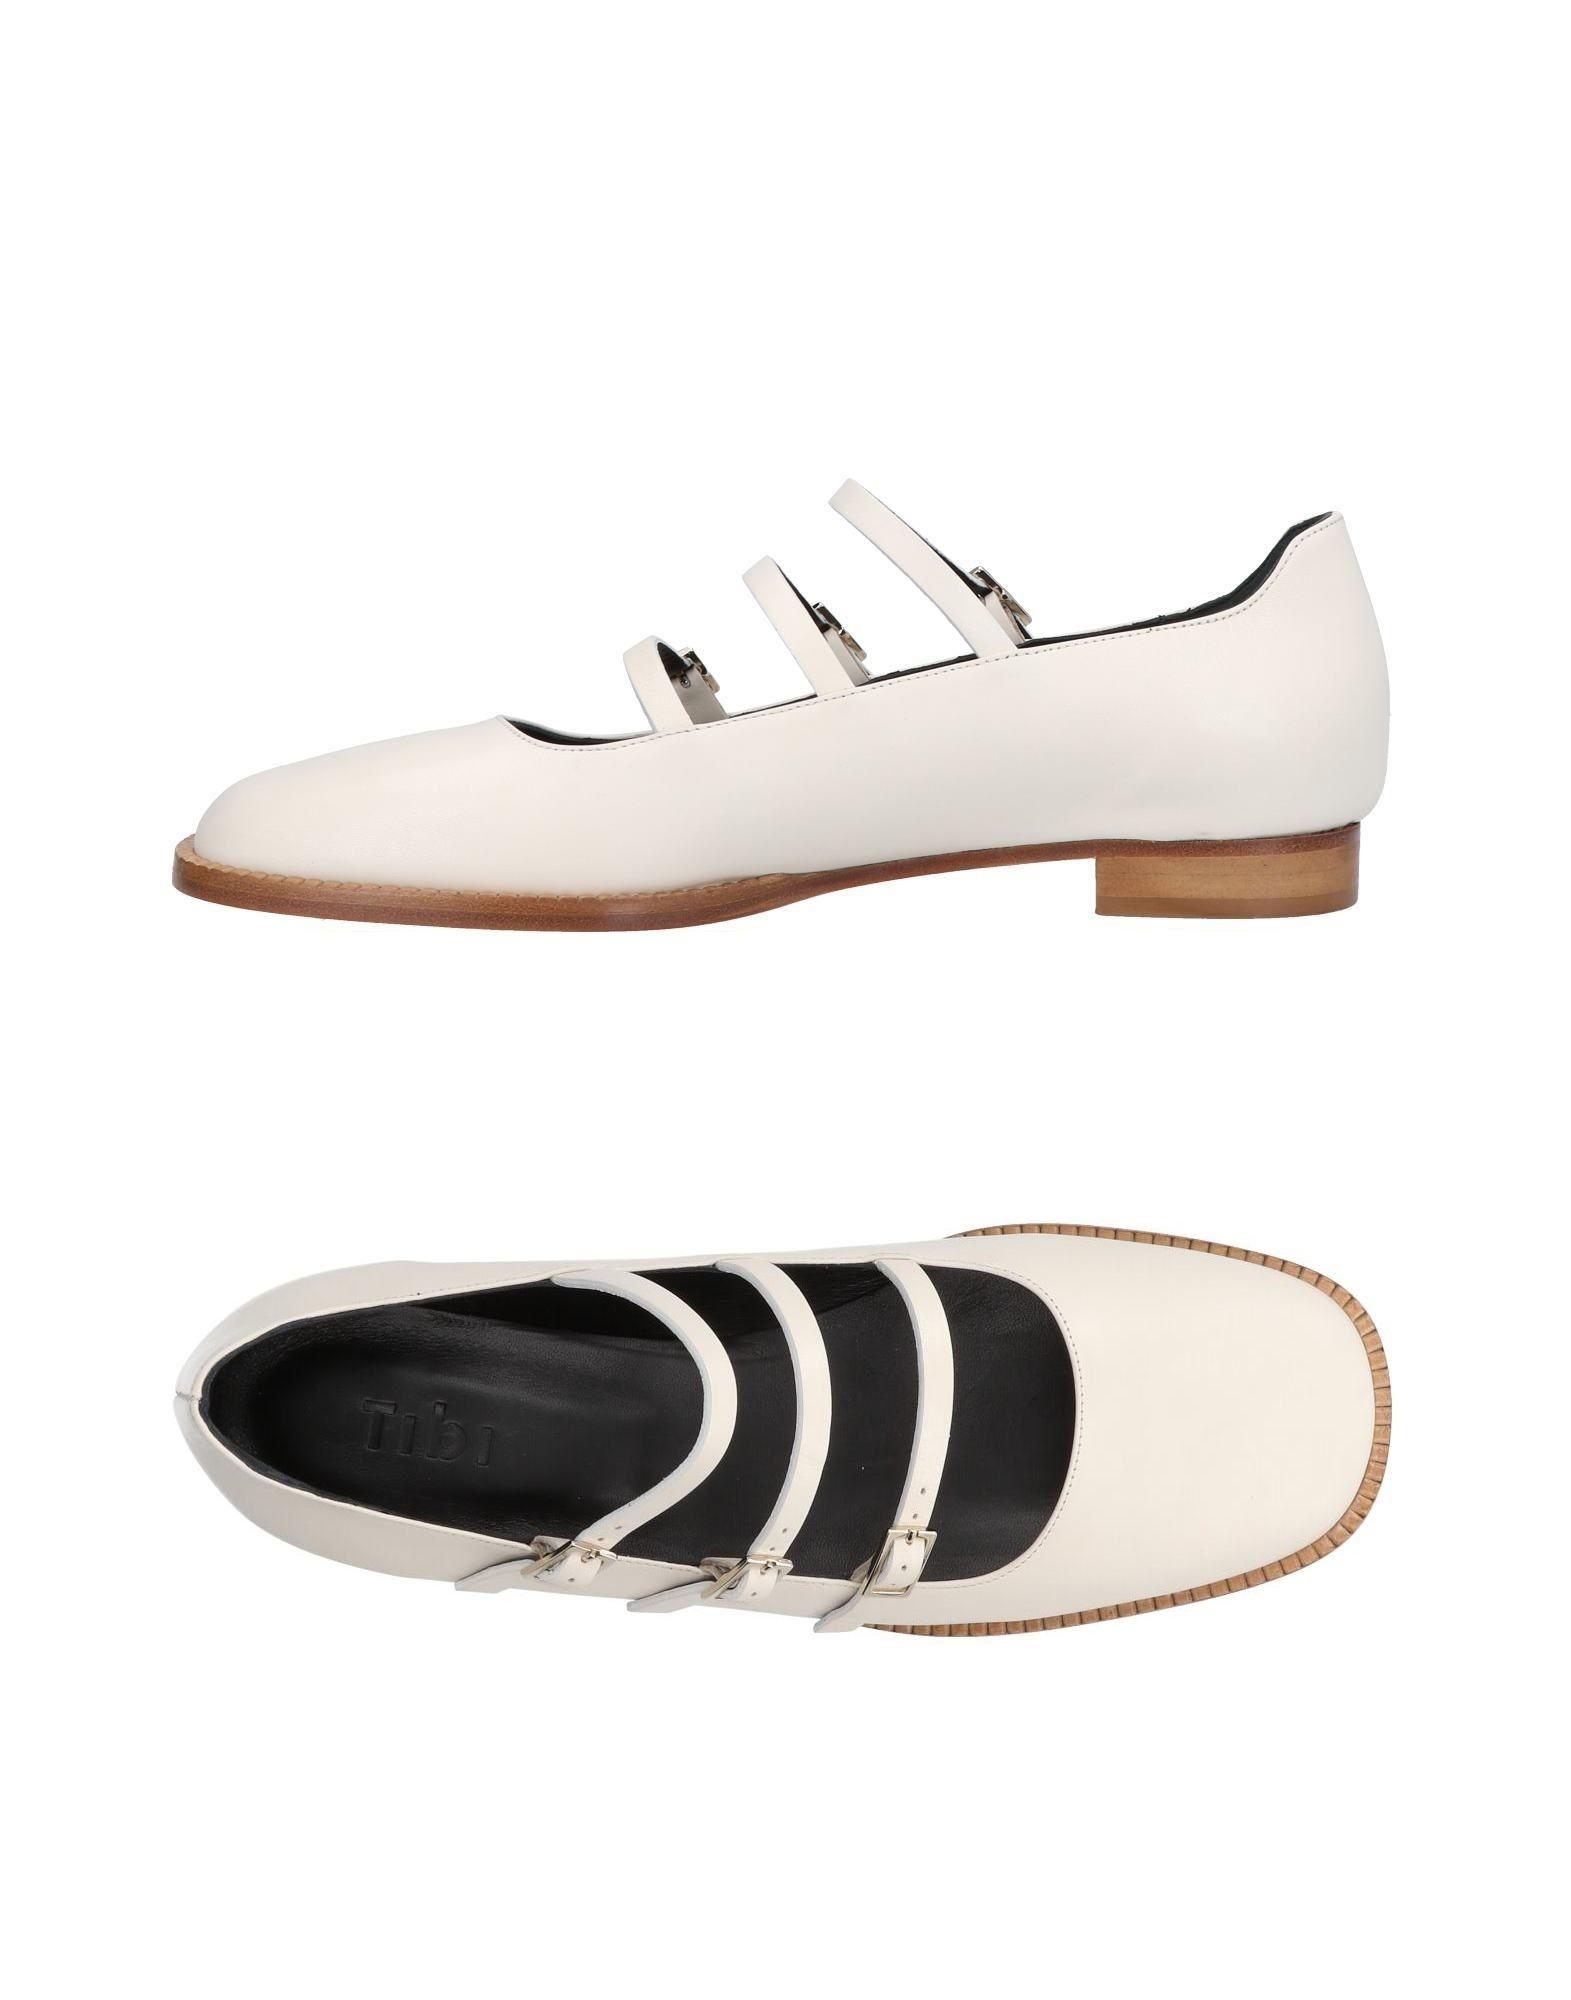 Tibi Ballet Flats - Women on Tibi Ballet Flats online on Women  Australia - 11453260MC 822afe